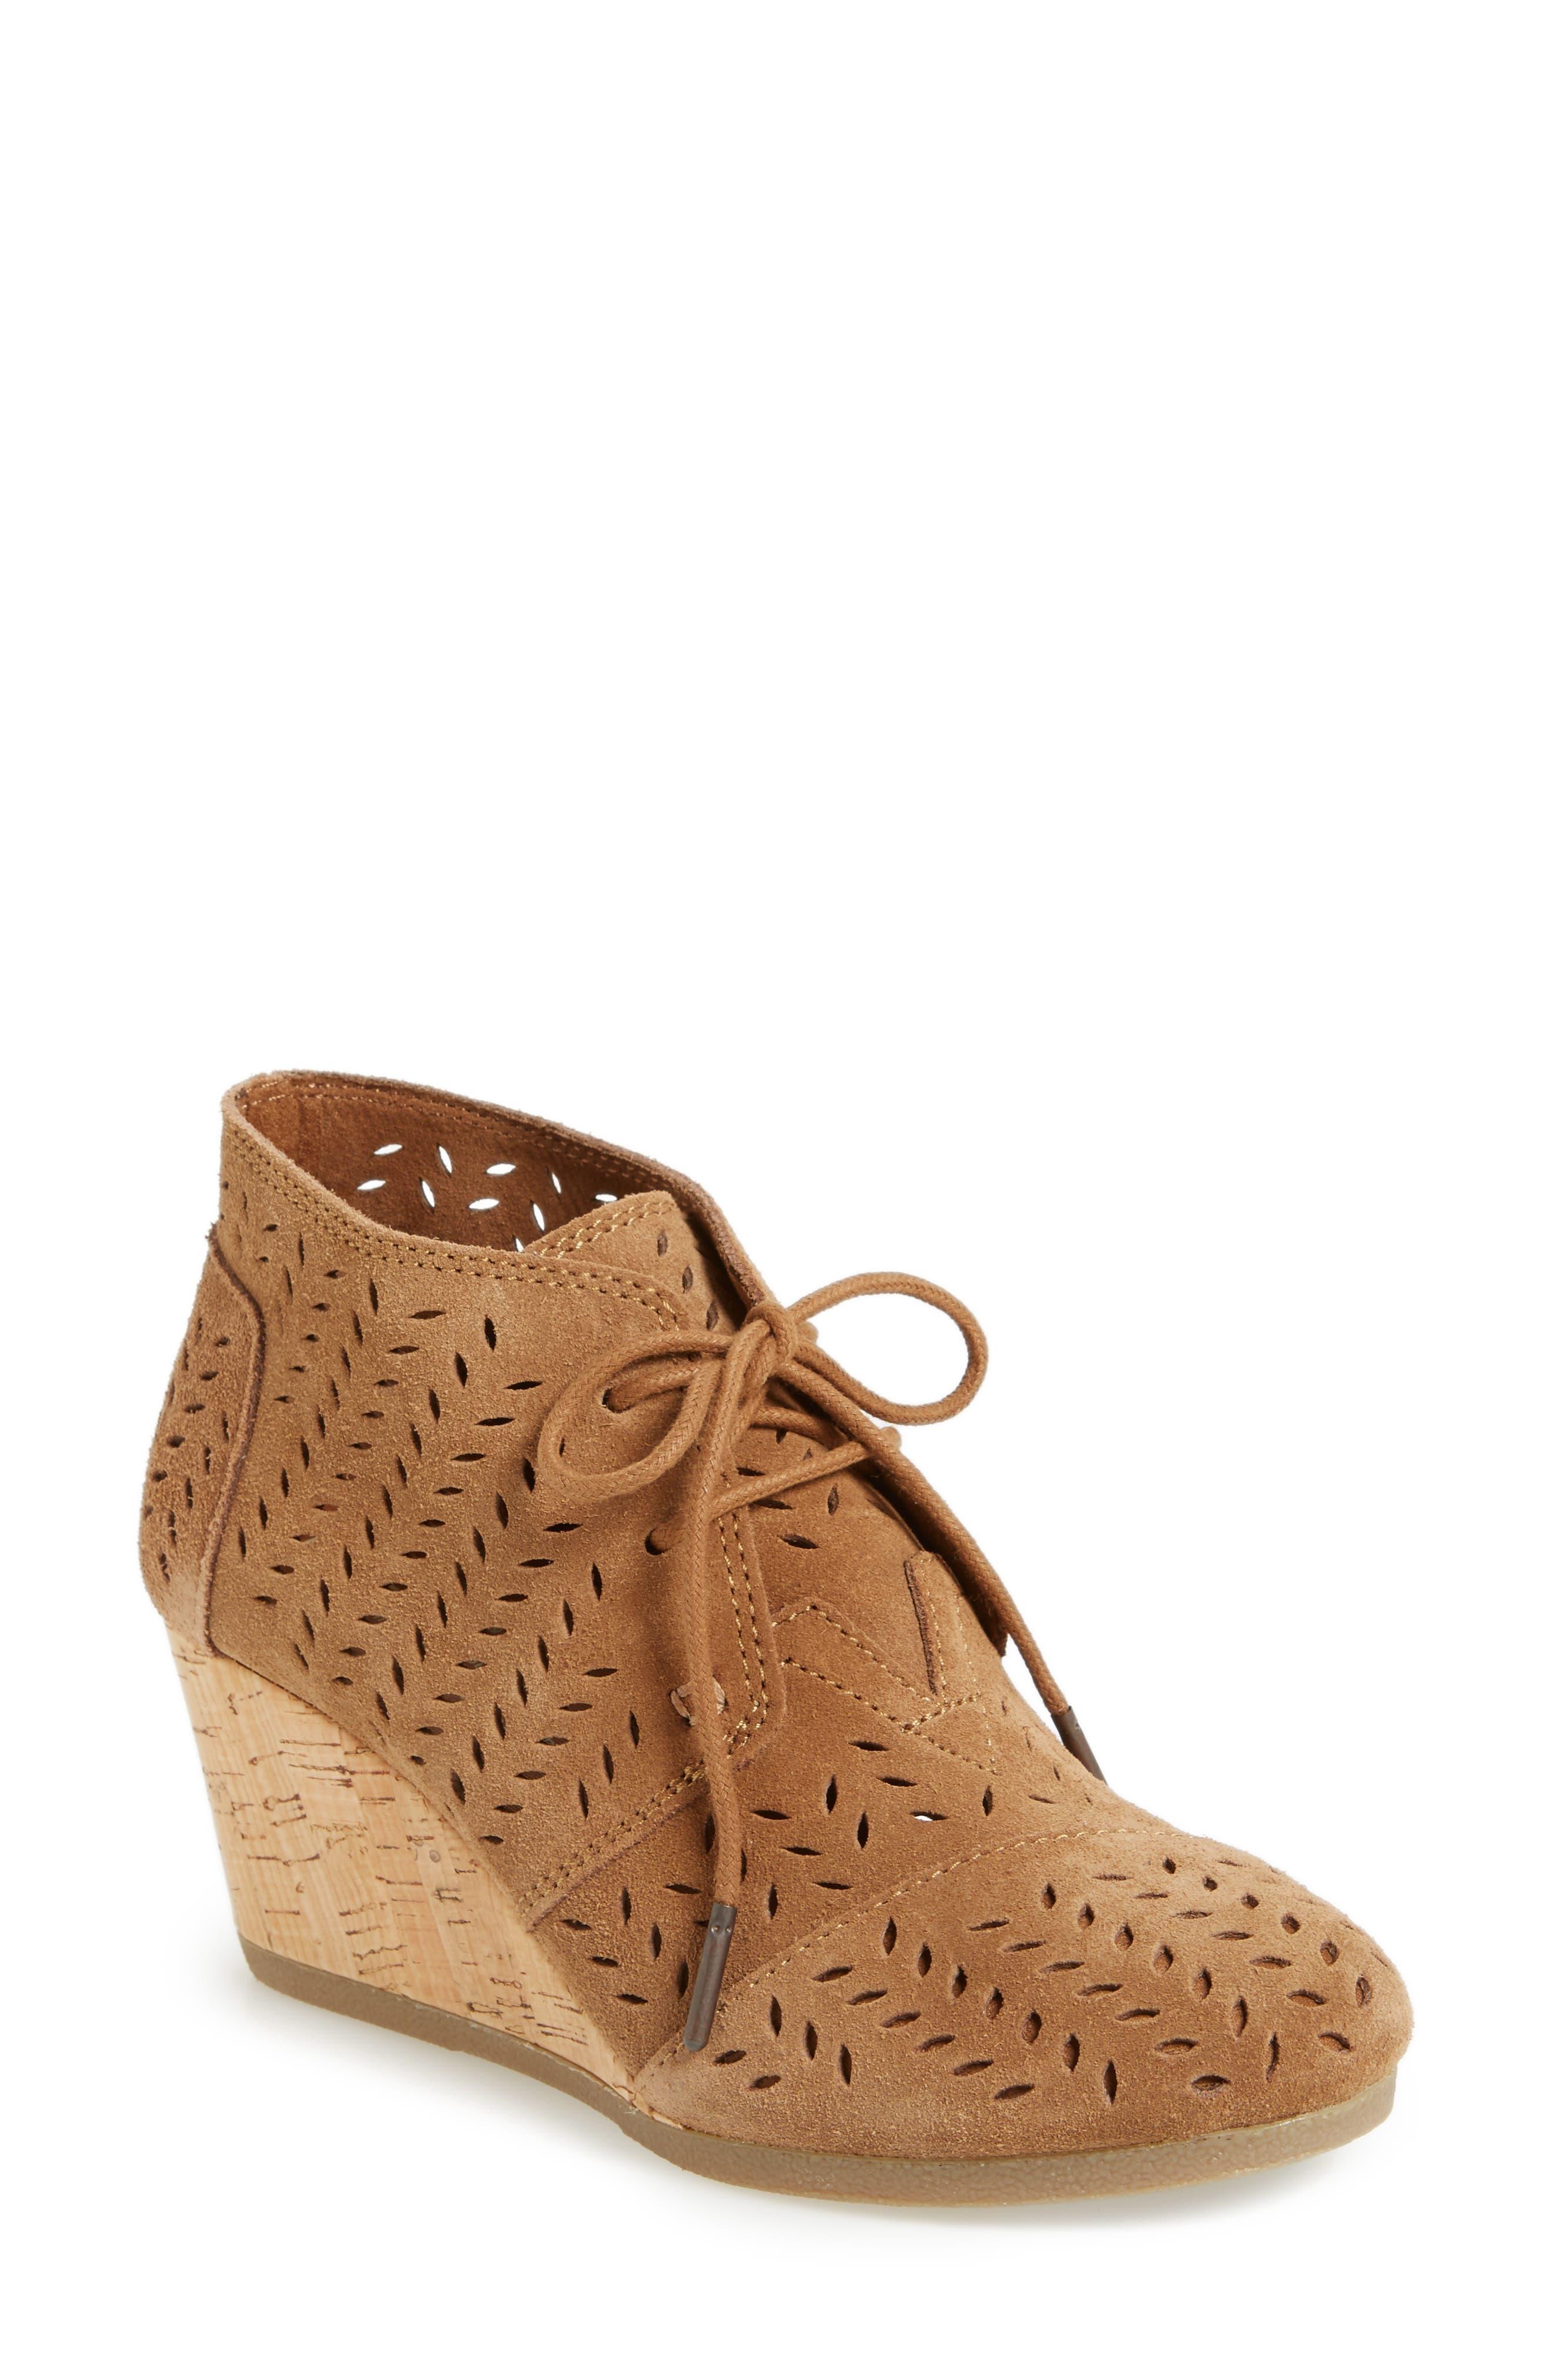 Main Image - TOMS Perforated Chukka Wedge Boot (Women)